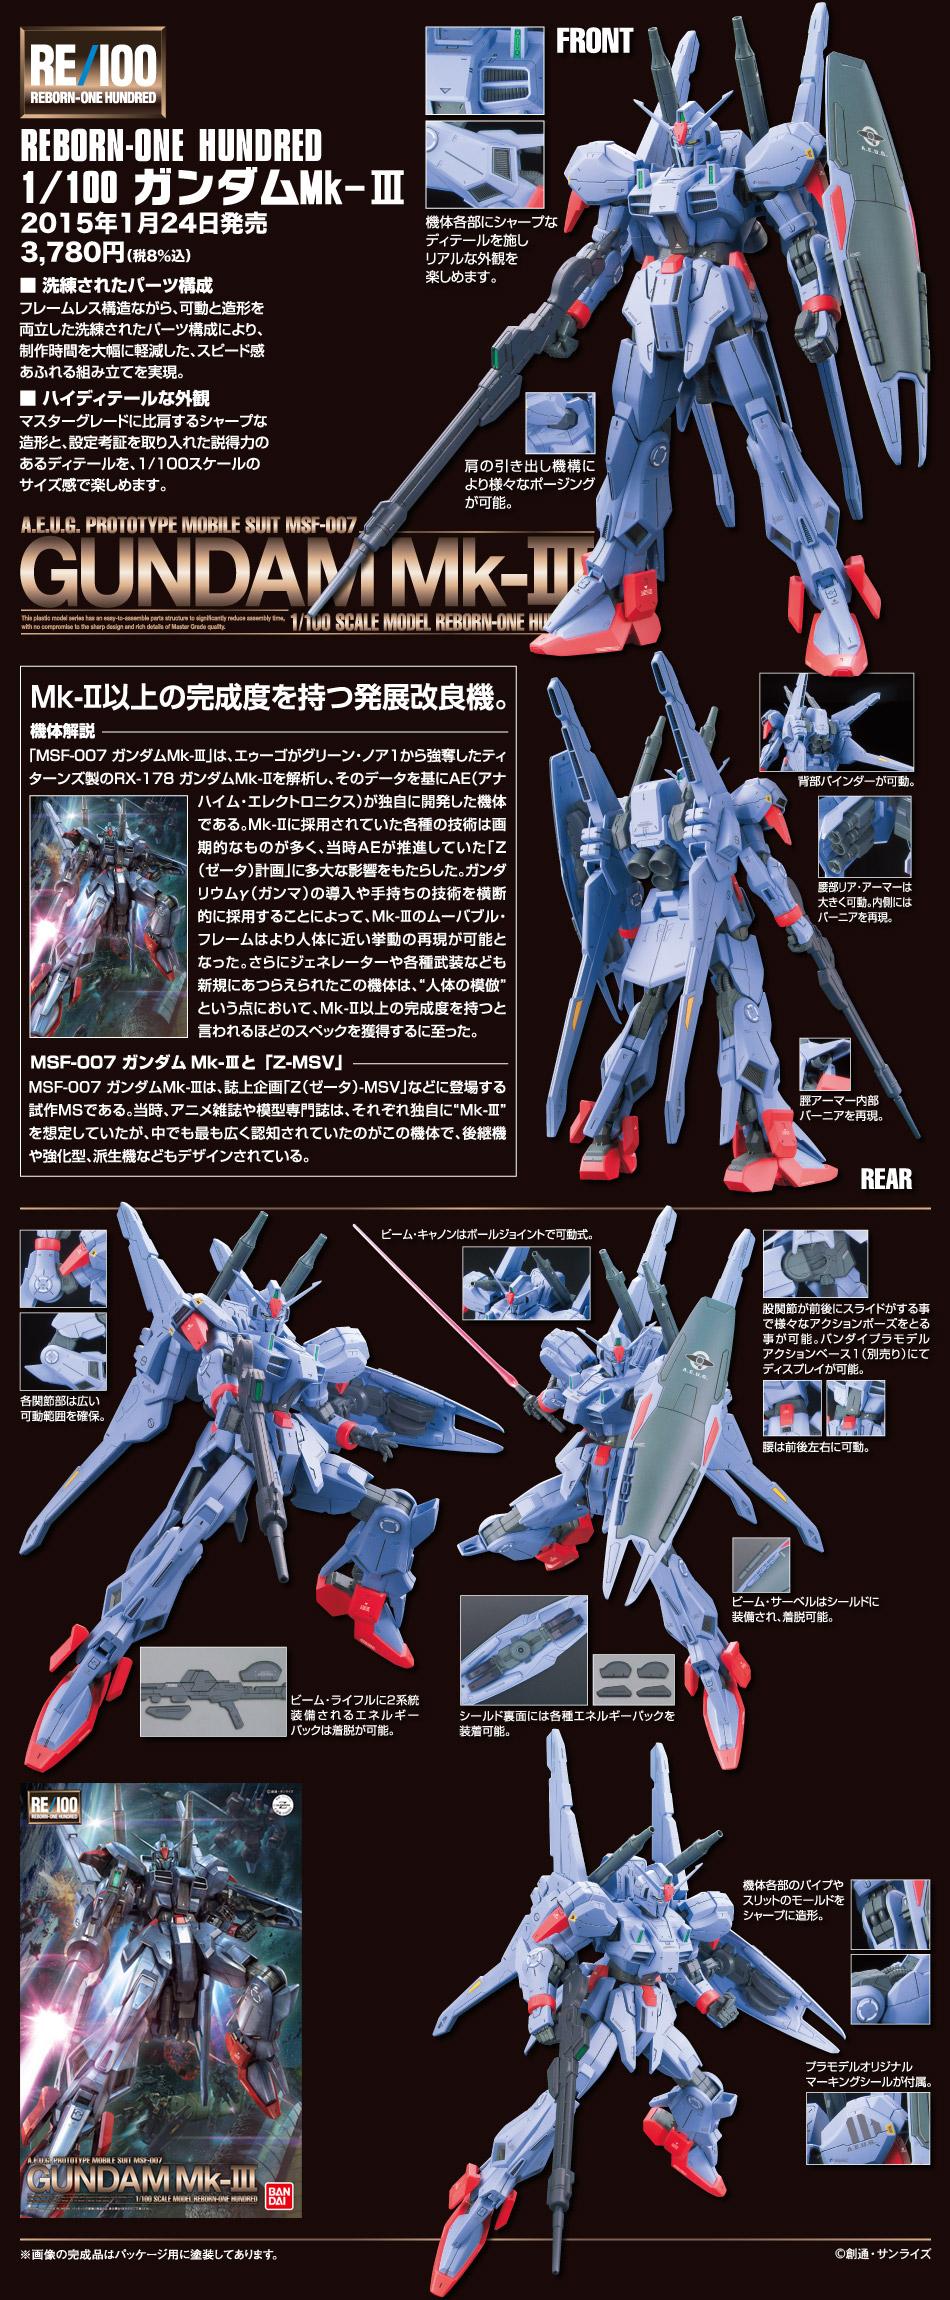 RE/100 1/100 MSF-007 ガンダムMk-III [Gundam Mk-III] 公式商品説明(画像)